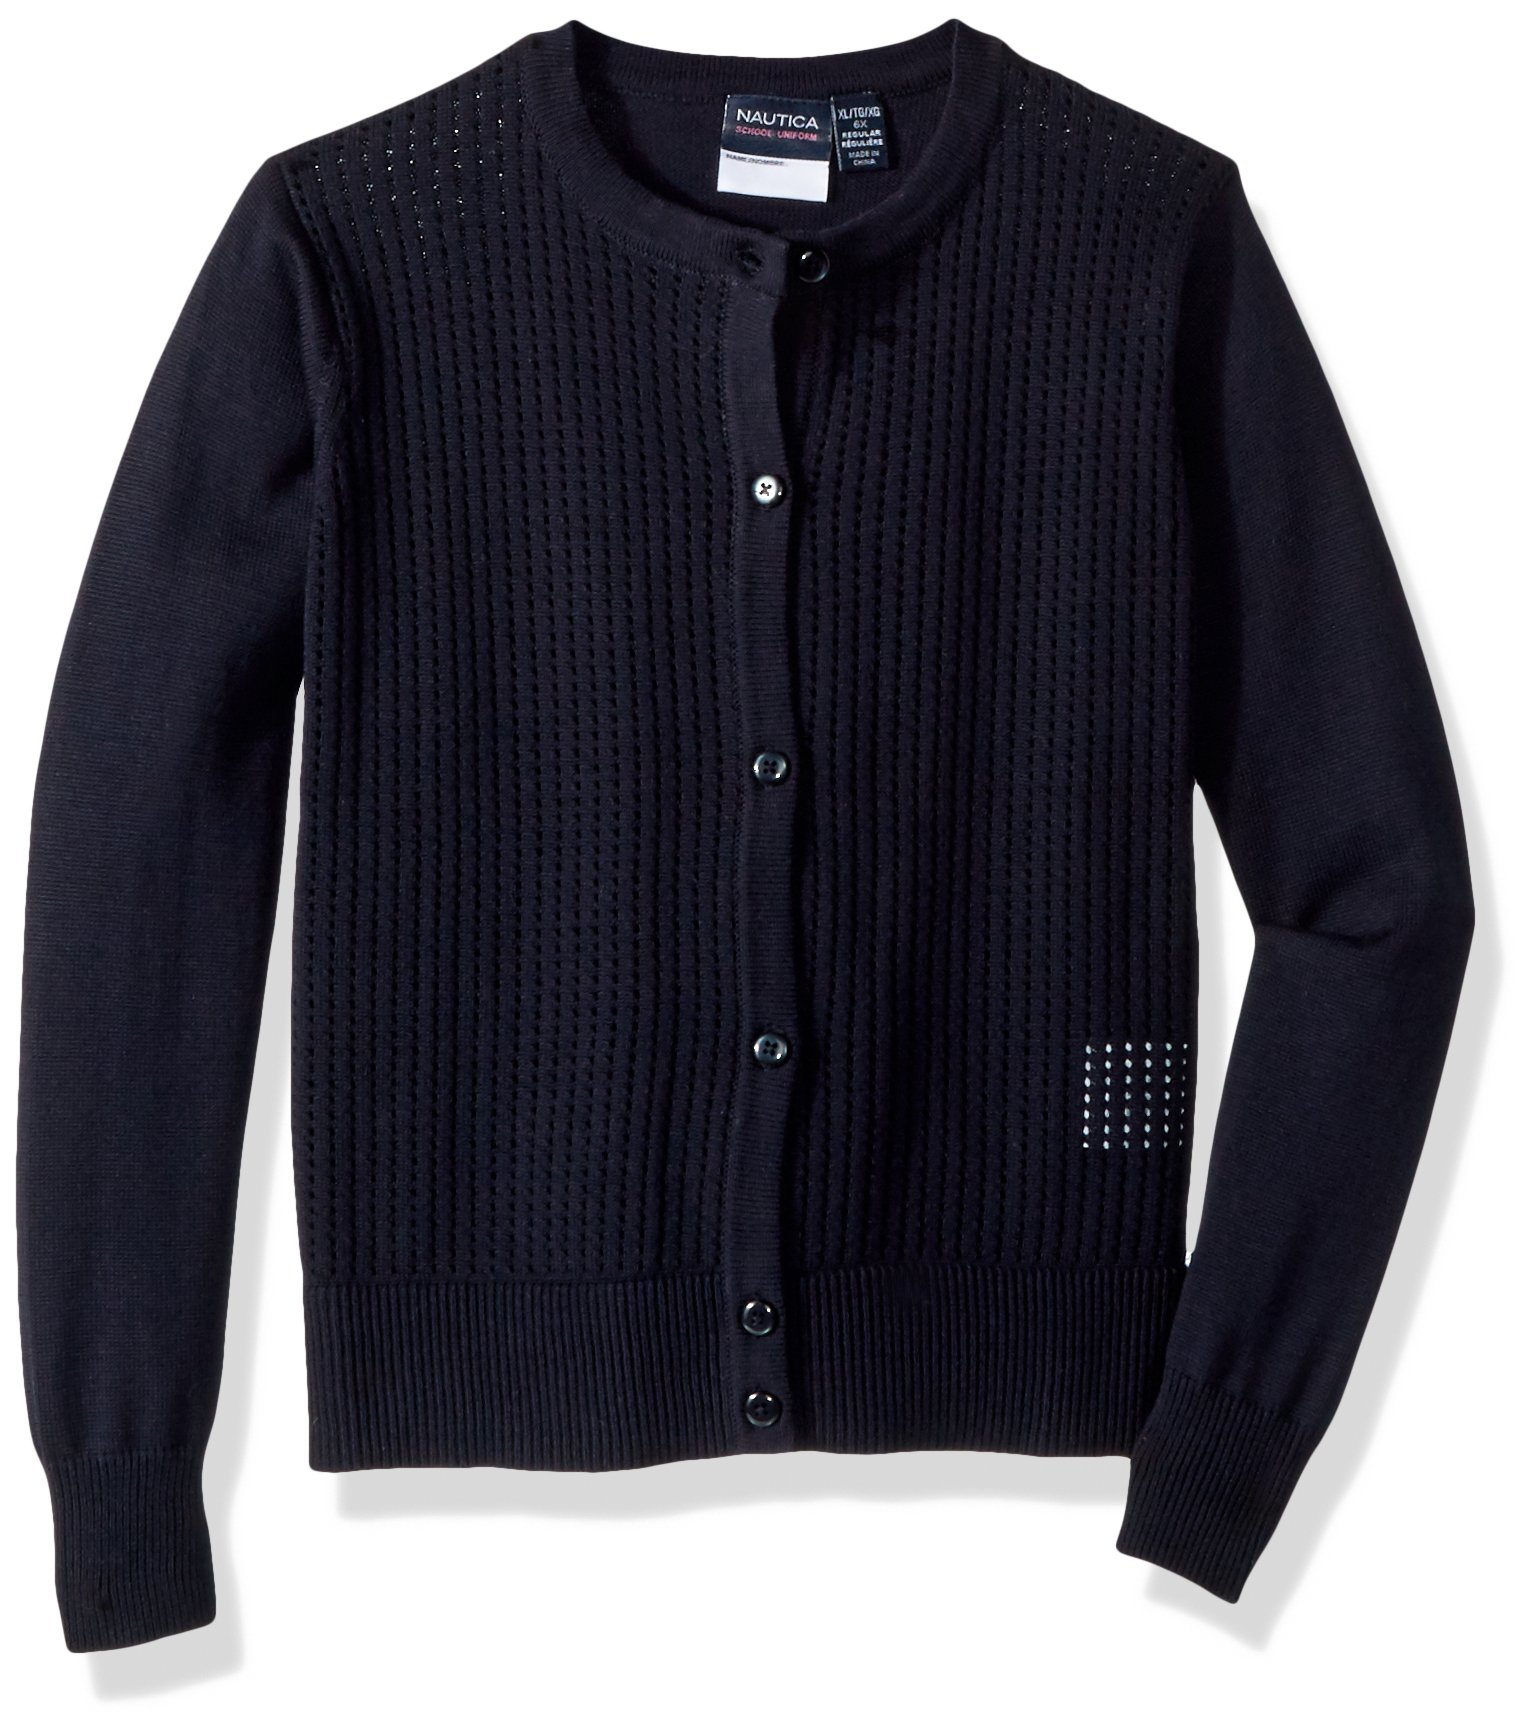 Nautica Girls' School Uniform Cardigan Sweater